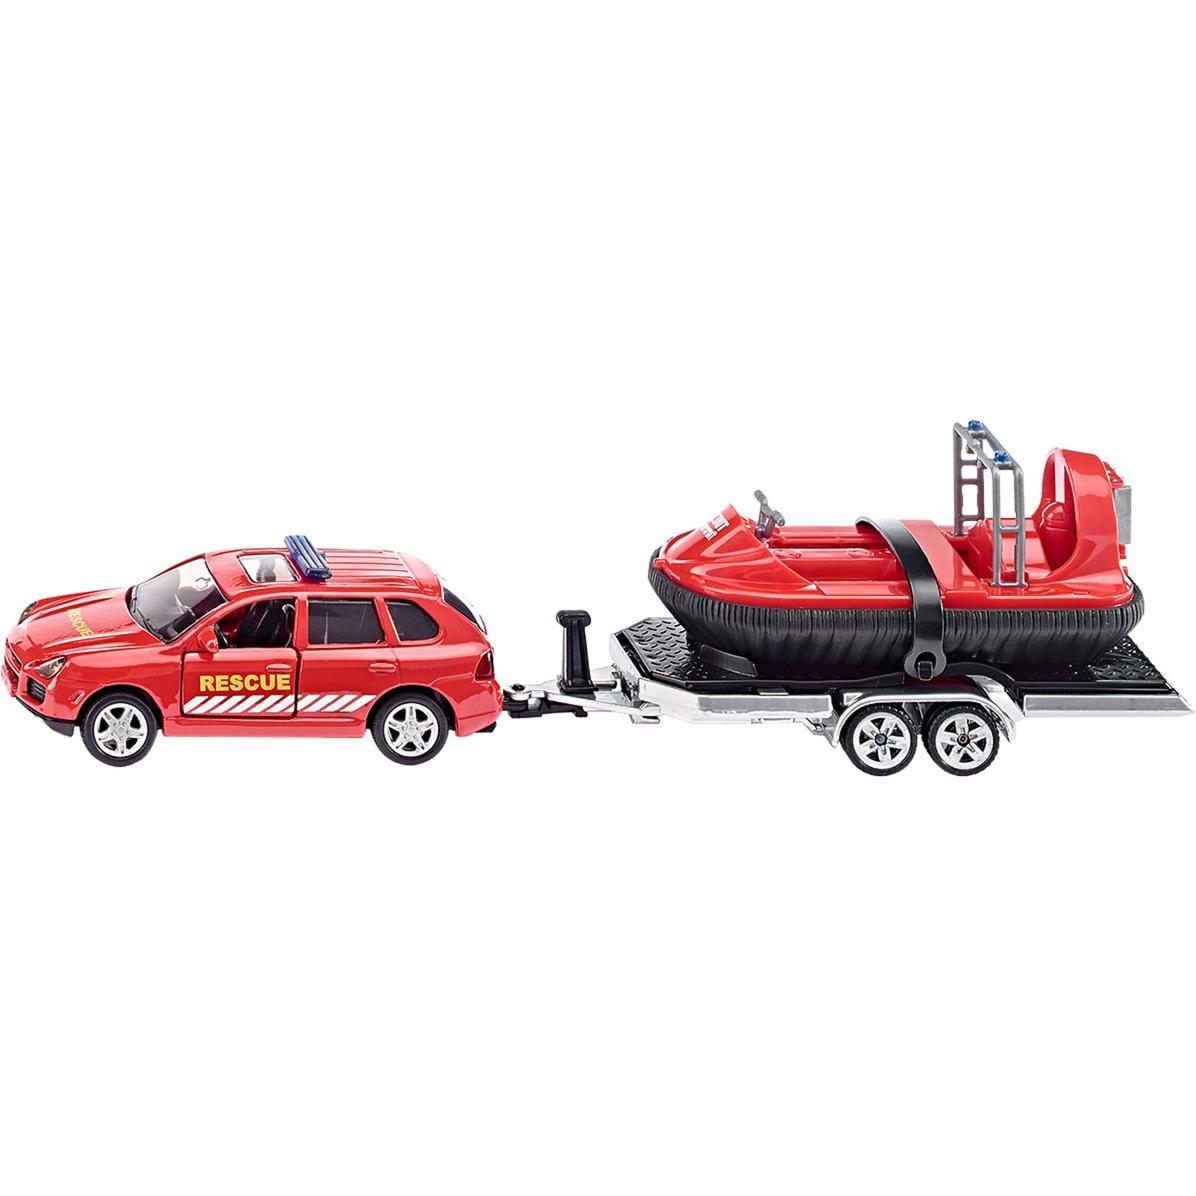 pkw-mit-anhaenger-und-hovercraft-model-koretoj